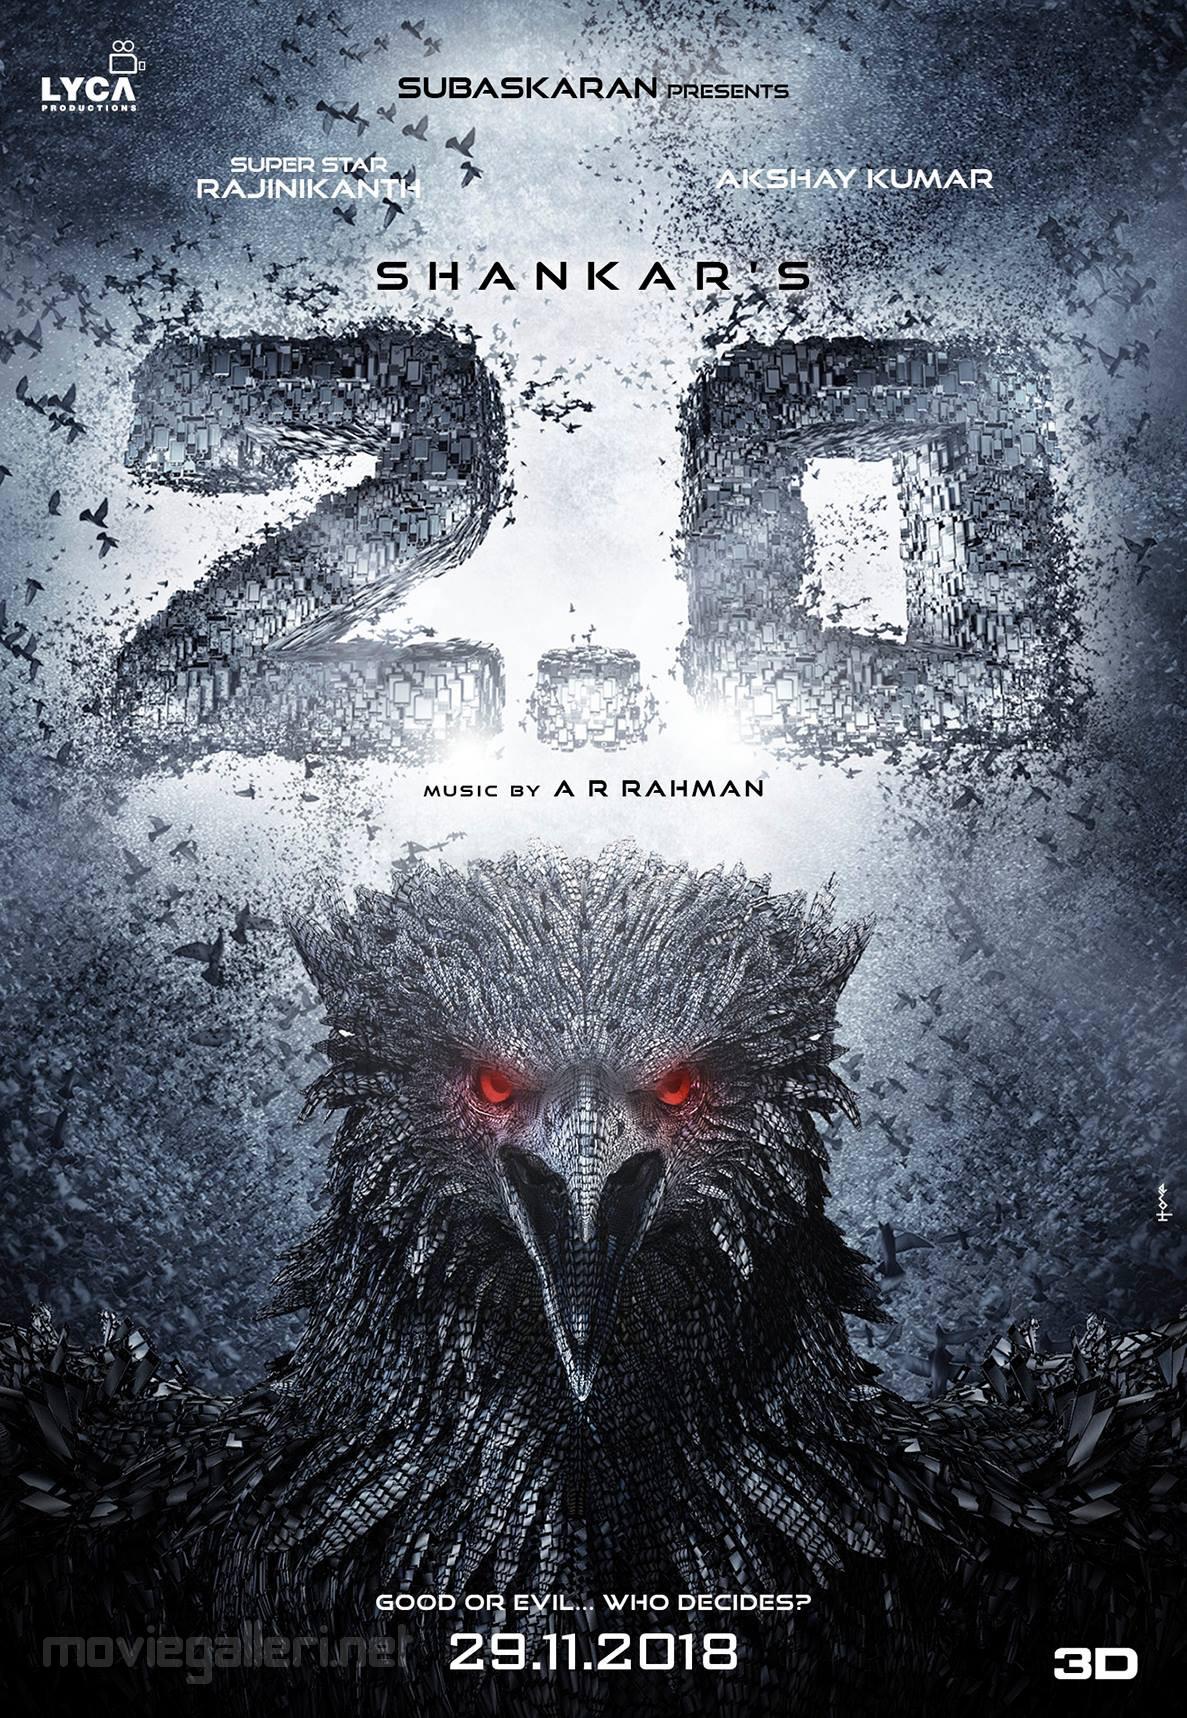 Rajinikanth's 2.0 Movie Release Date 29 November 2018 Poster HD